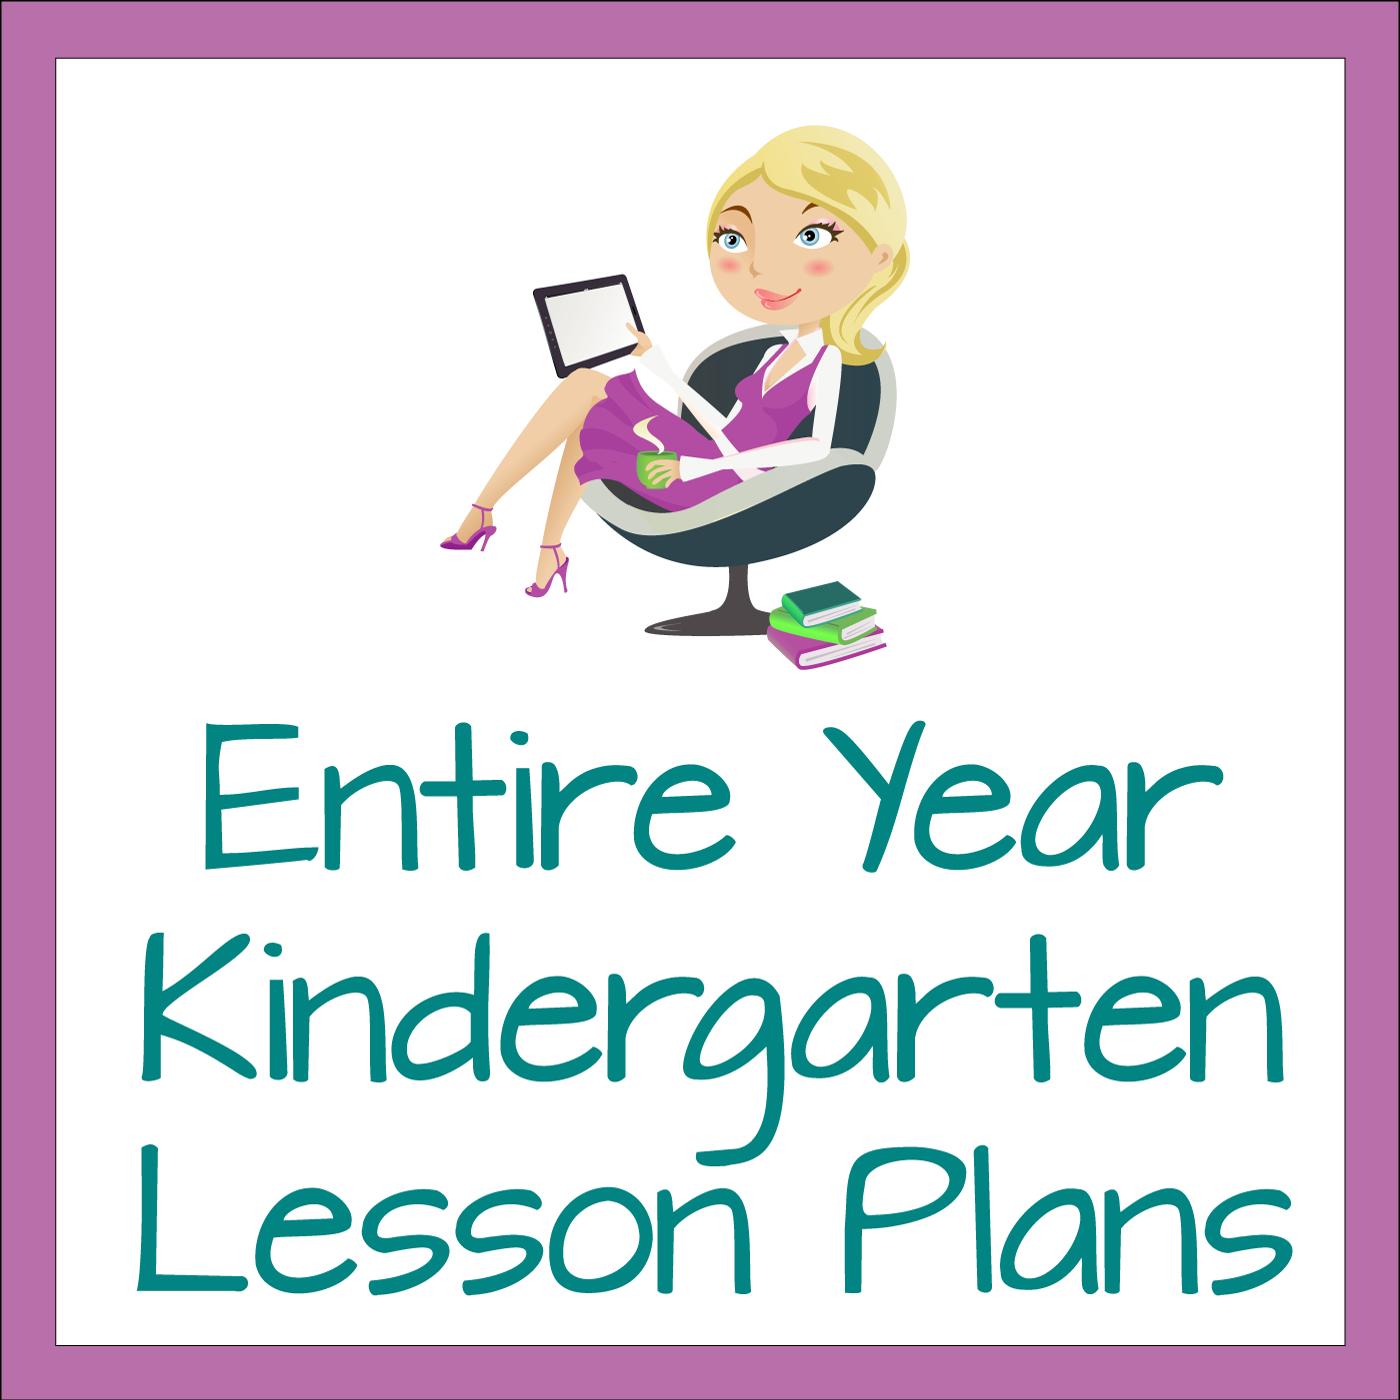 Kindergarten - Lesson Plans For Kindergarten